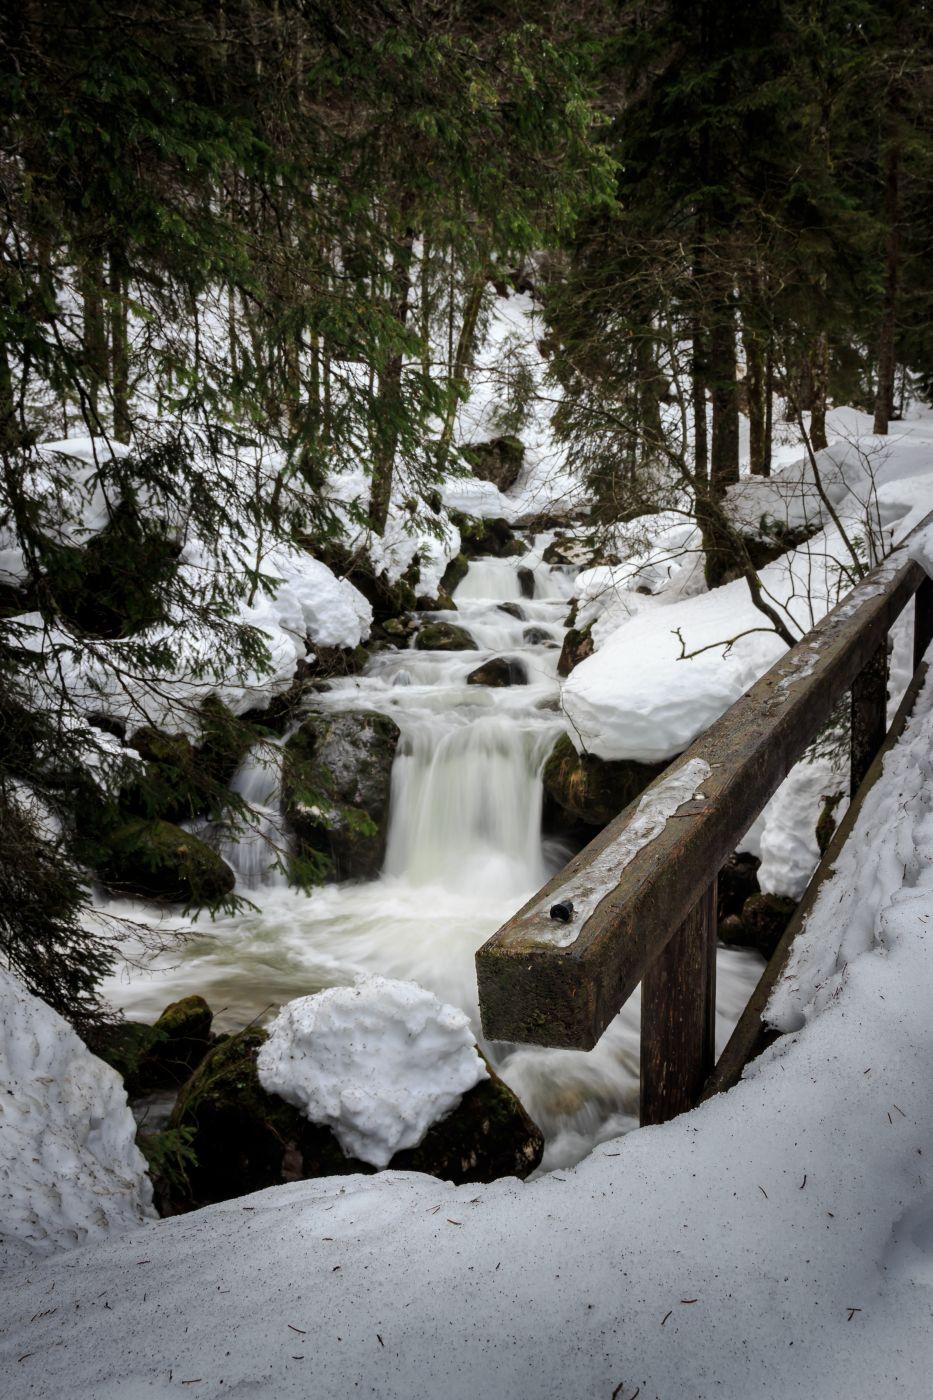 Sibli Waterfall (Rottach-Egern), Germany